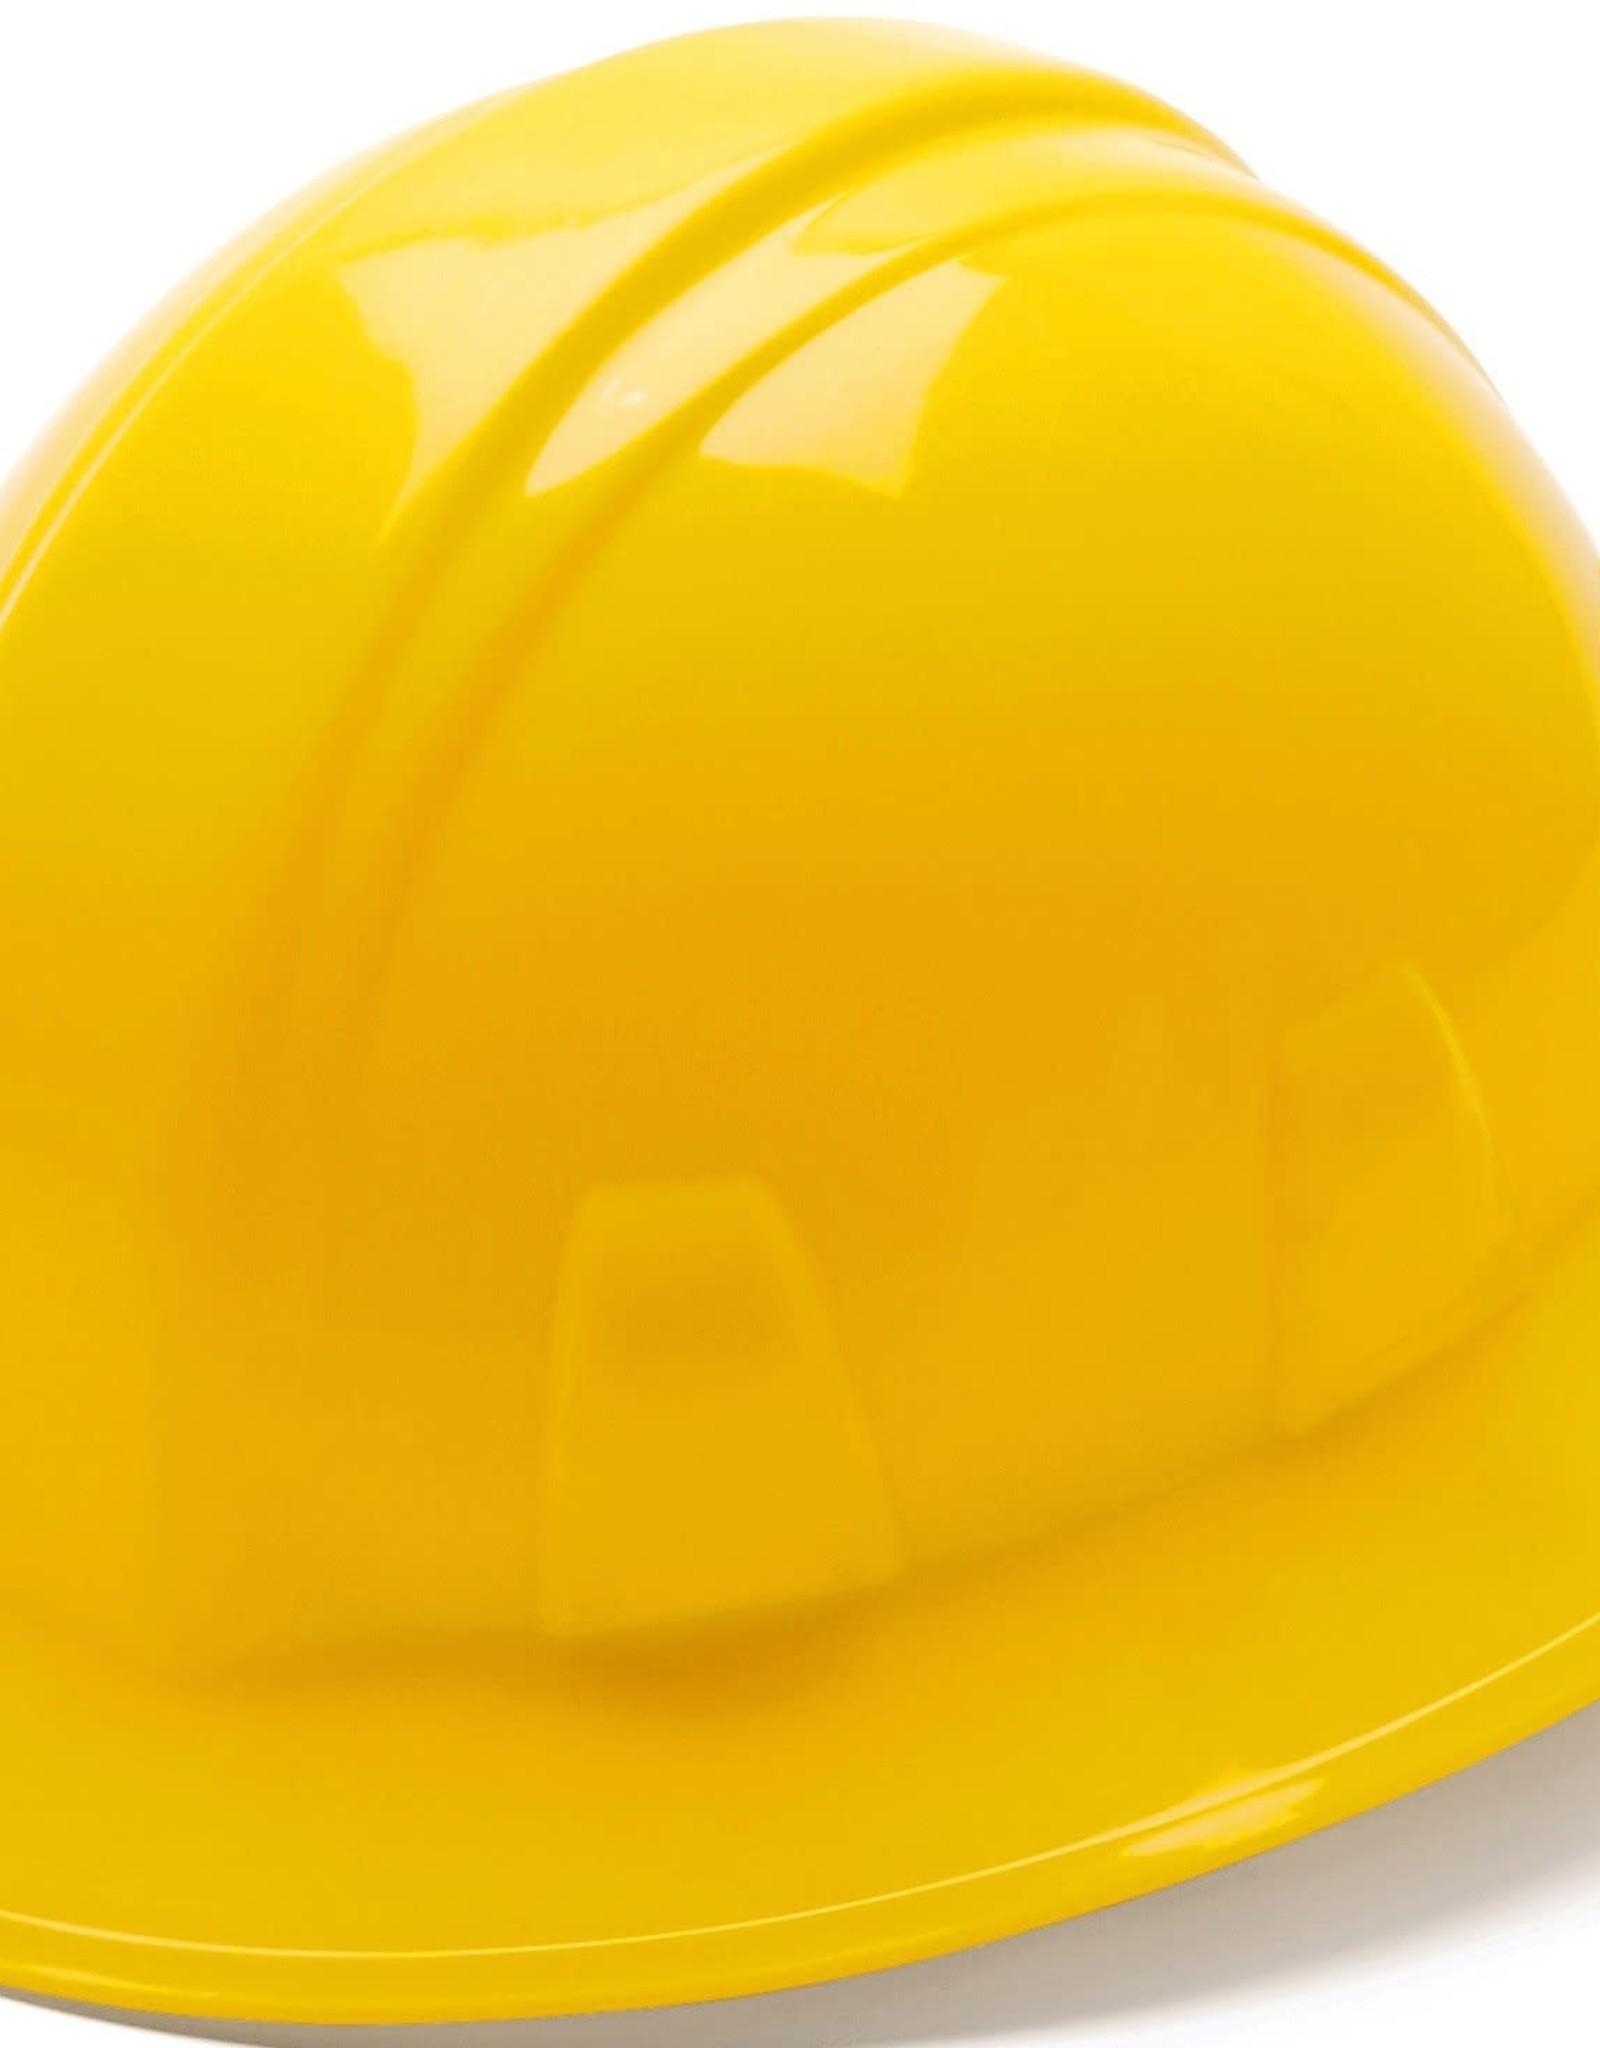 Pyramex Pyramex Yellow Full Brim Hard Hat 4pt rachet